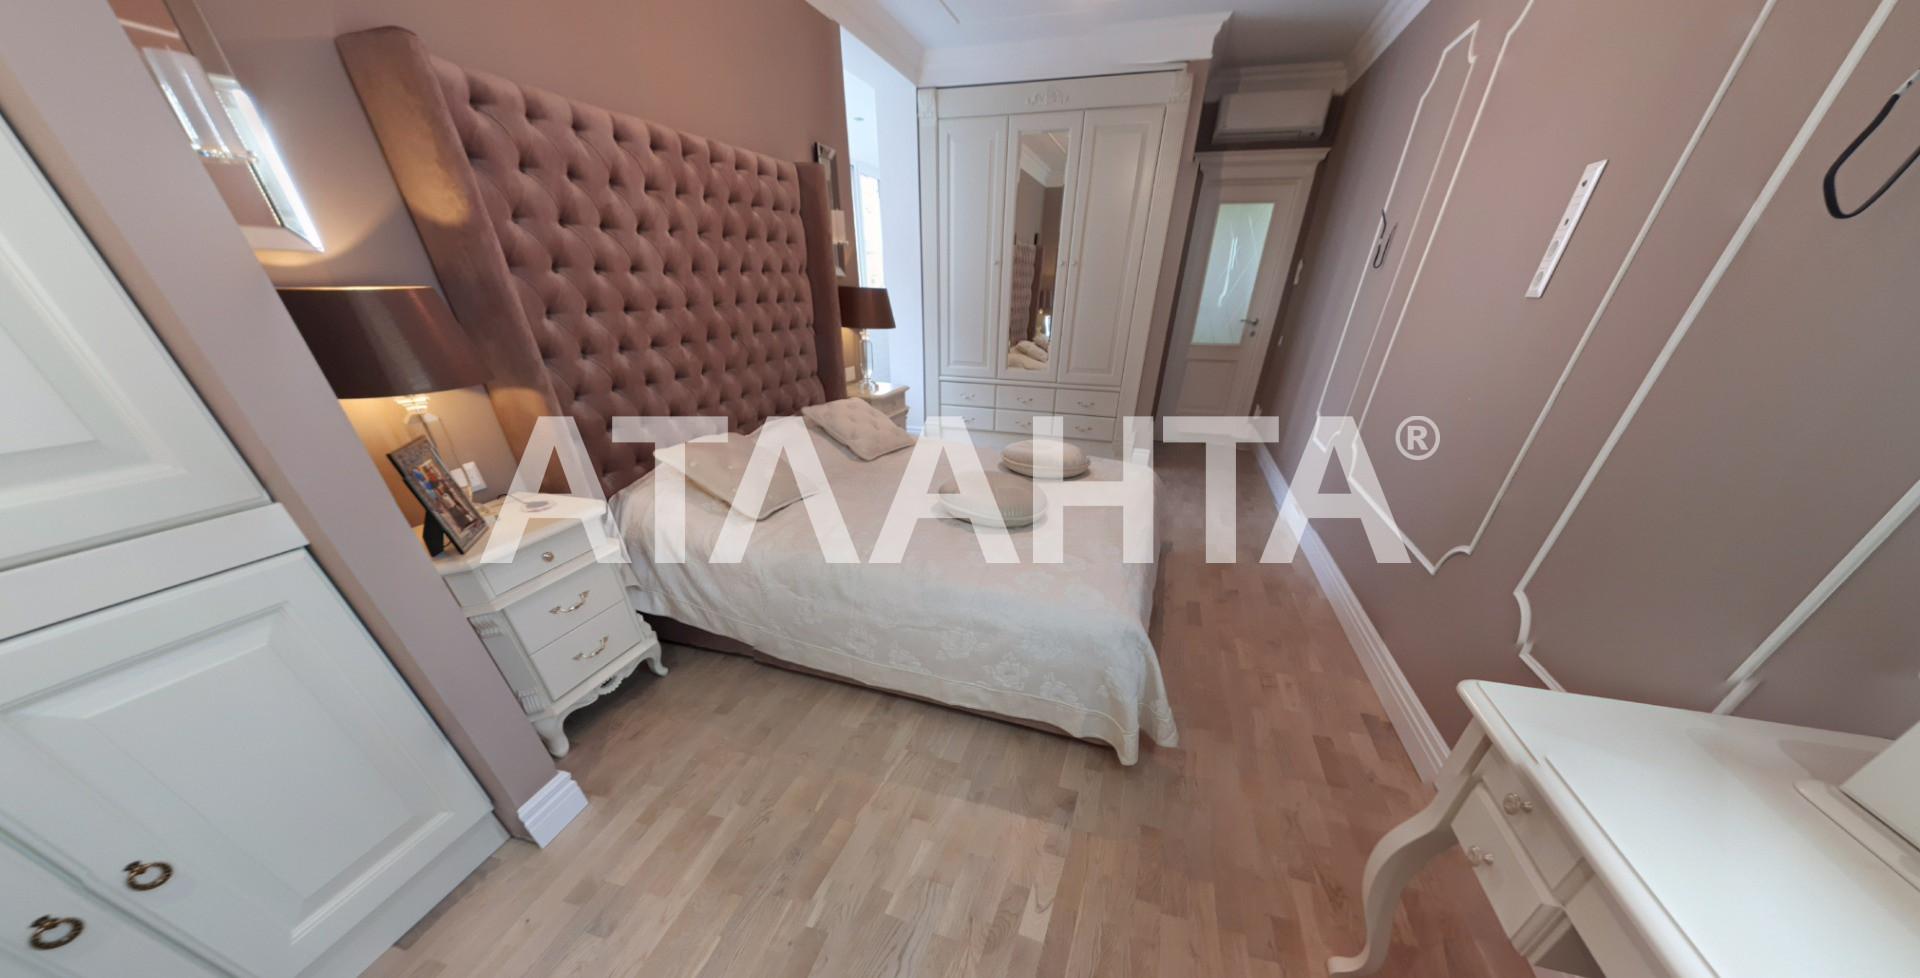 Продается 3-комнатная Квартира на ул. Ул. Ломоносова — 230 000 у.е. (фото №21)